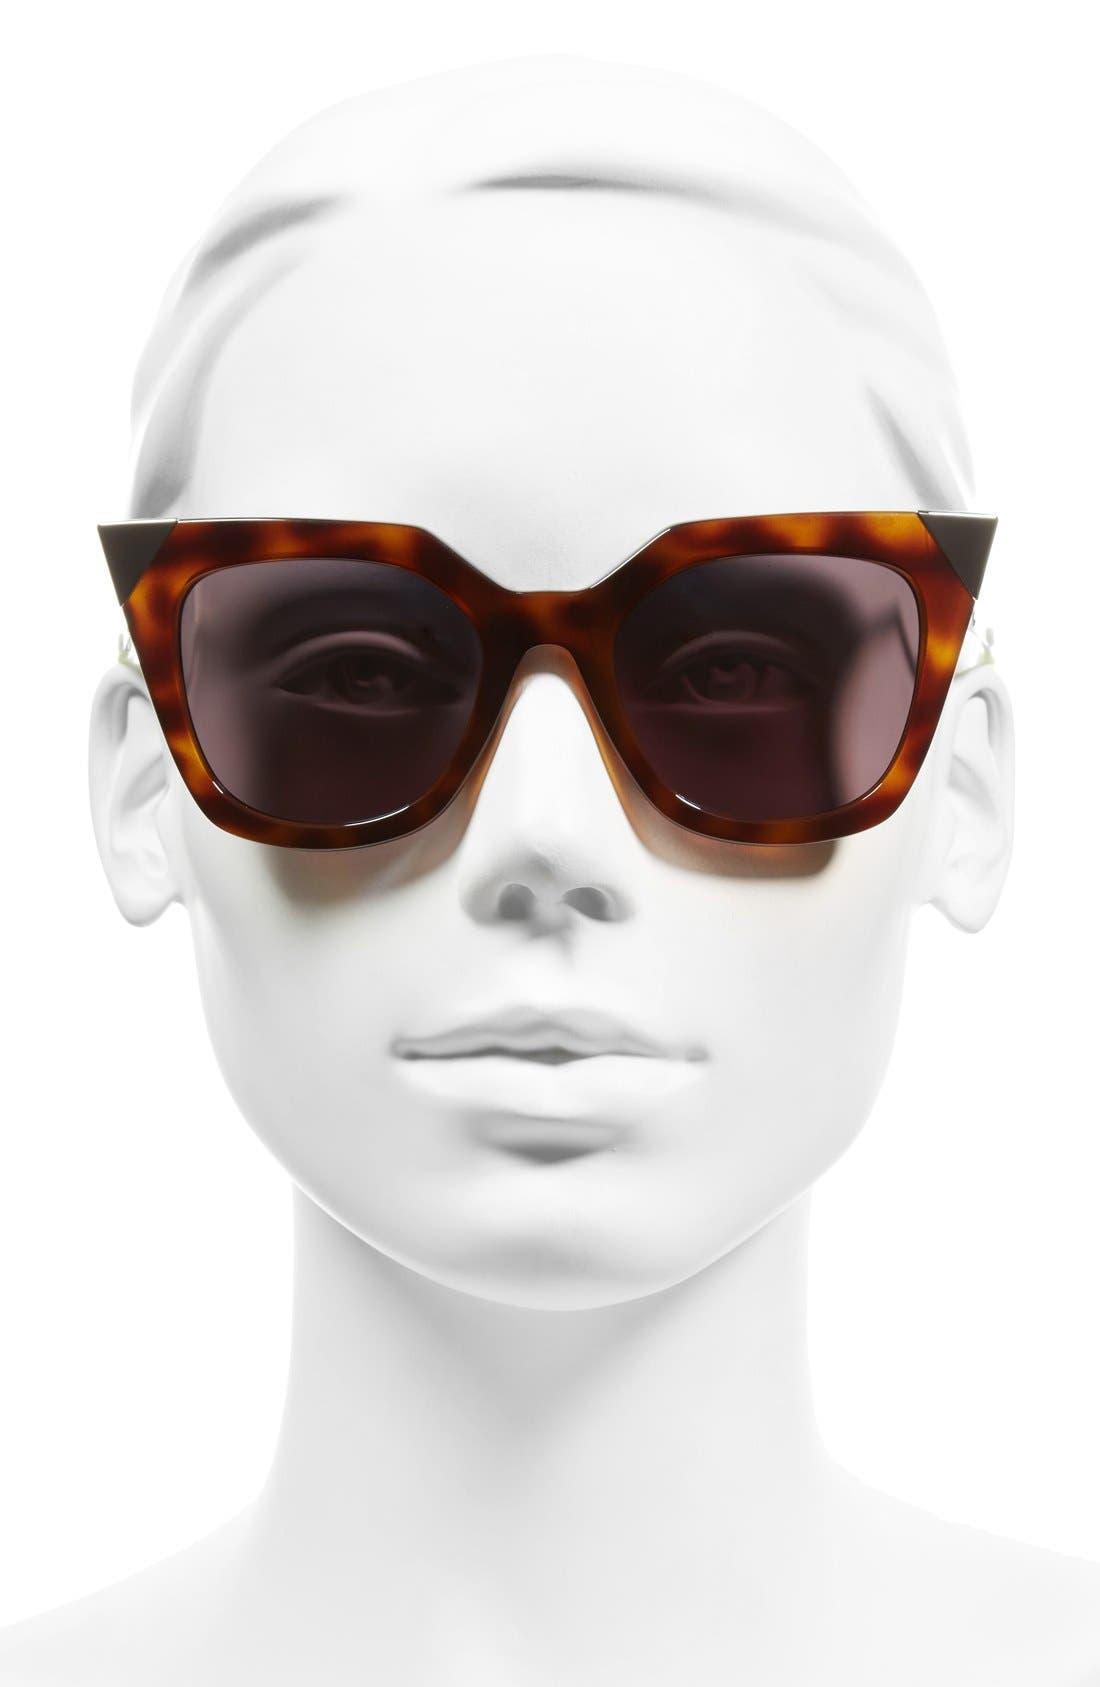 52mm Cat Eye Sunglasses,                             Alternate thumbnail 11, color,